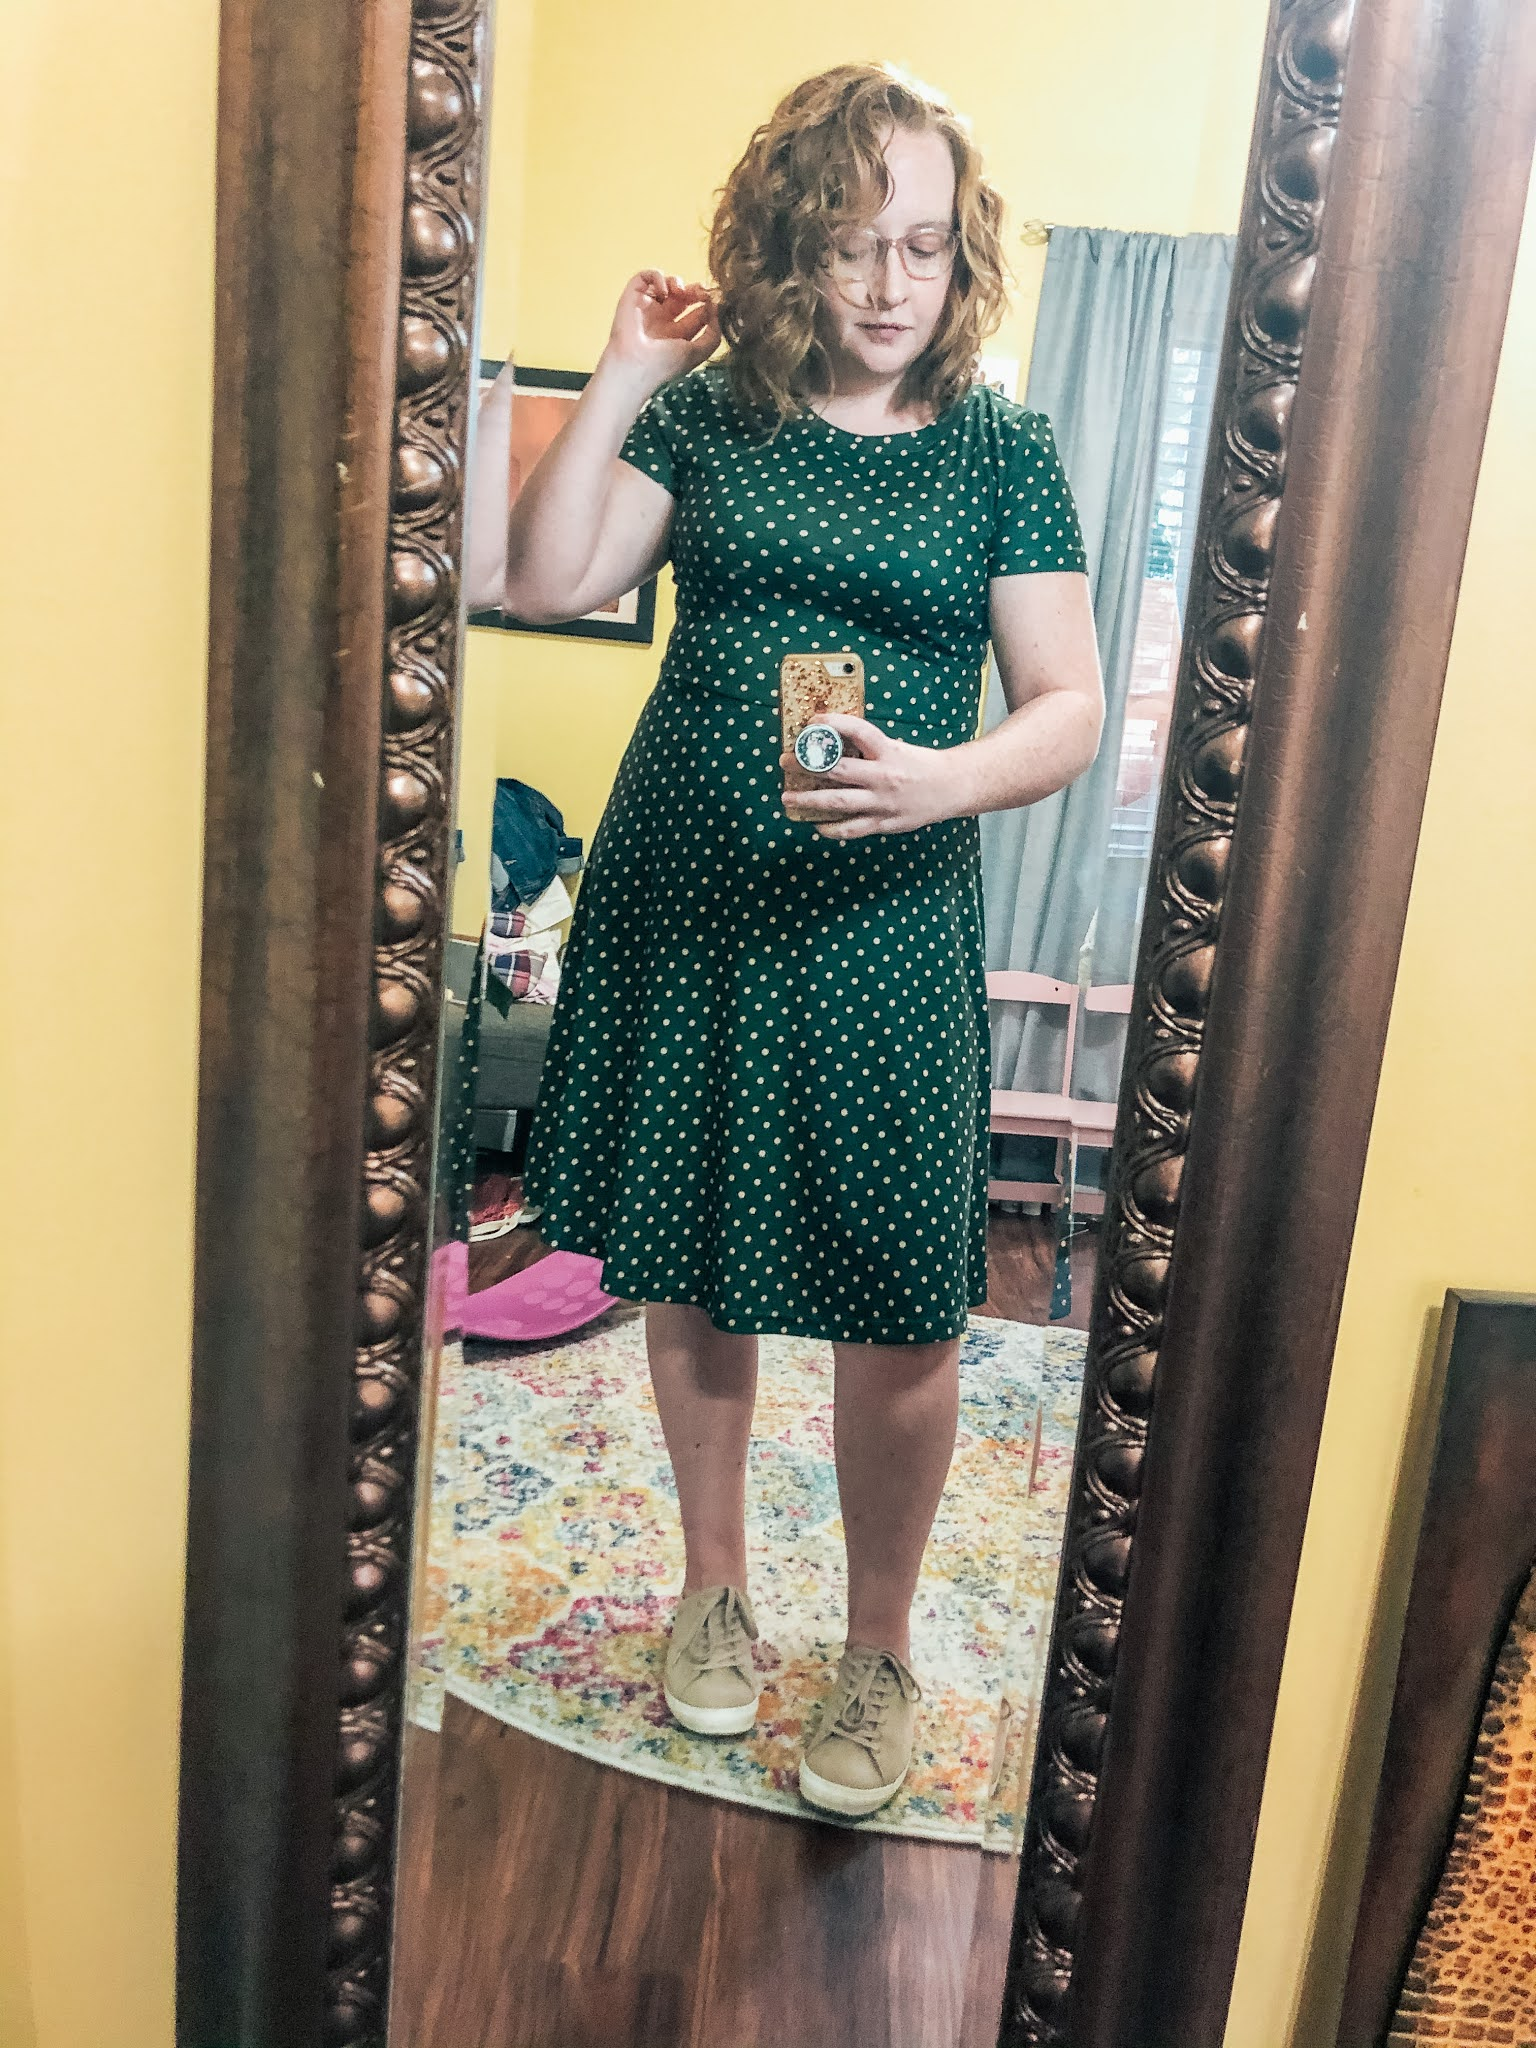 green-polka-dot-dress-taupe-sneakers